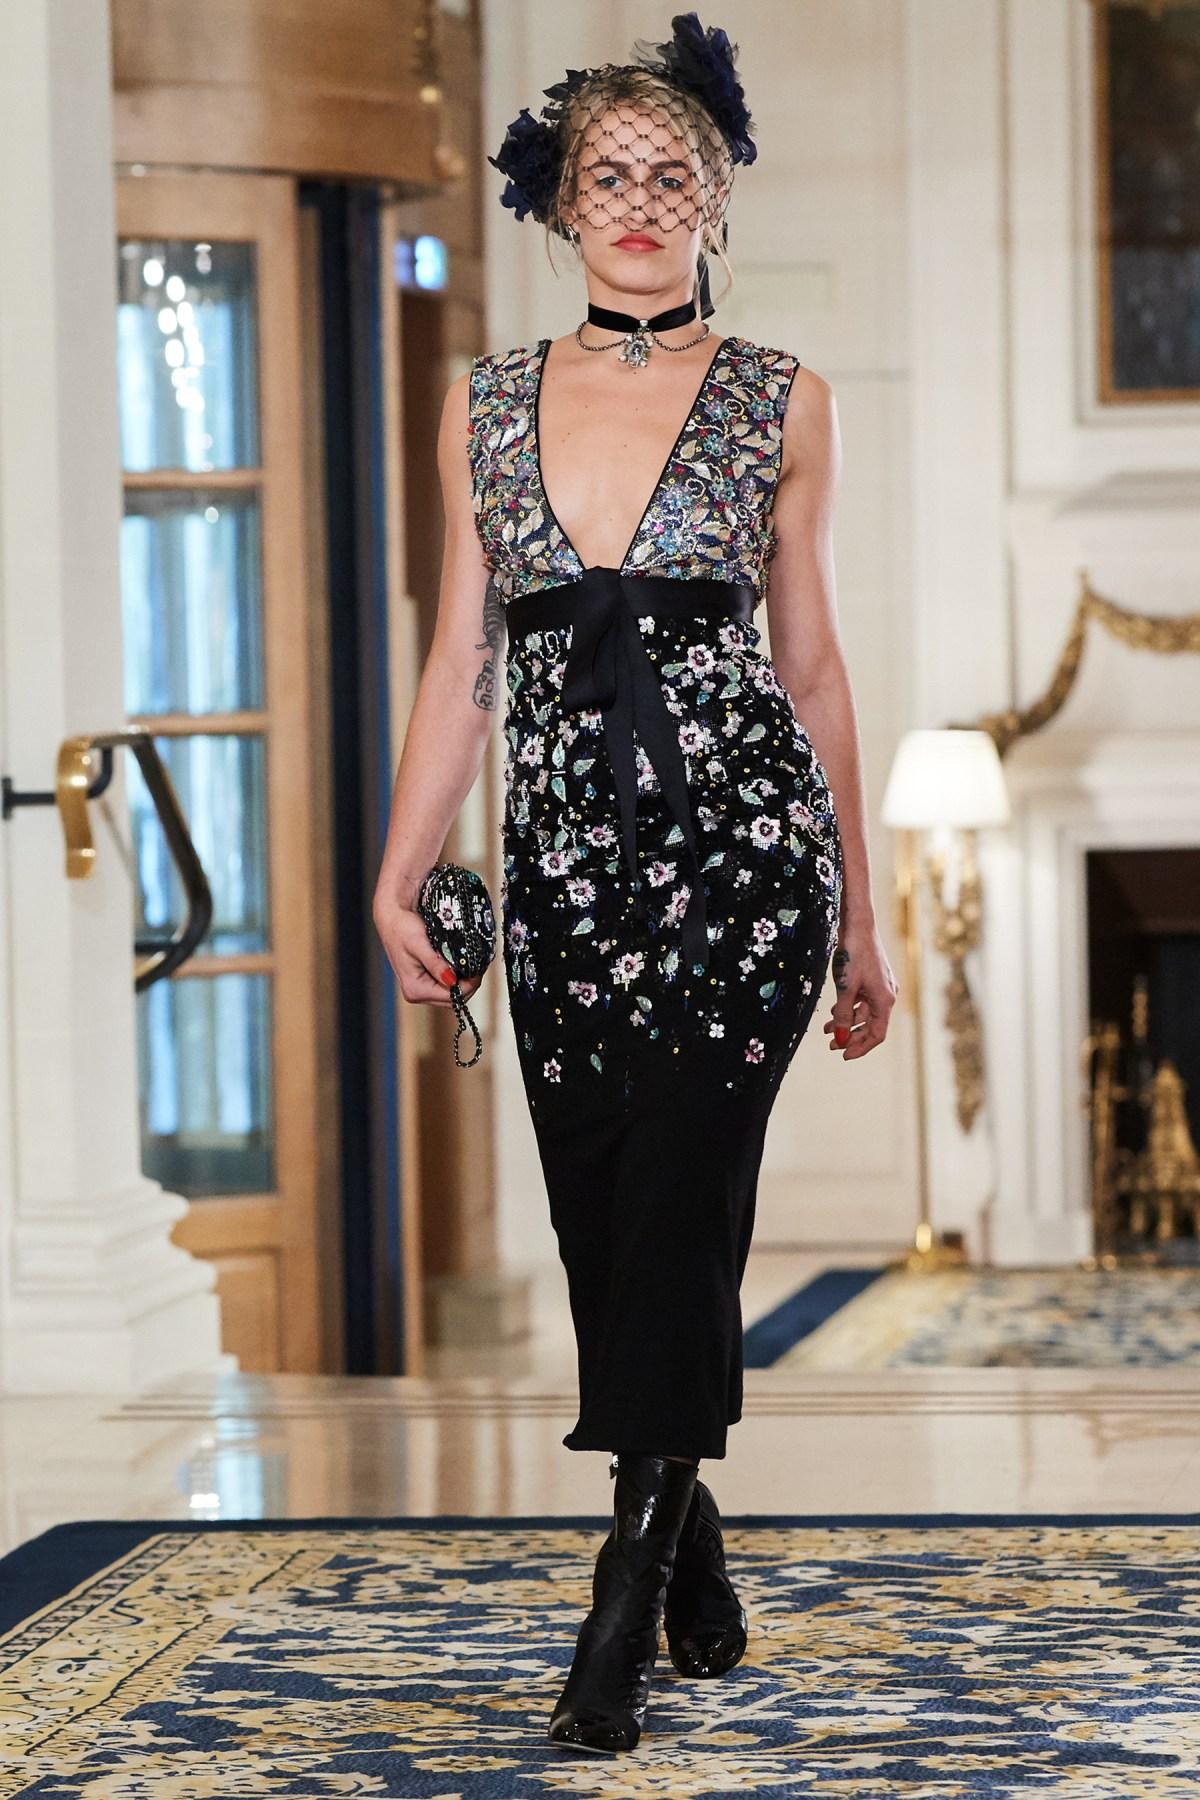 Chanel Metiers d'Art PO FW16 0130